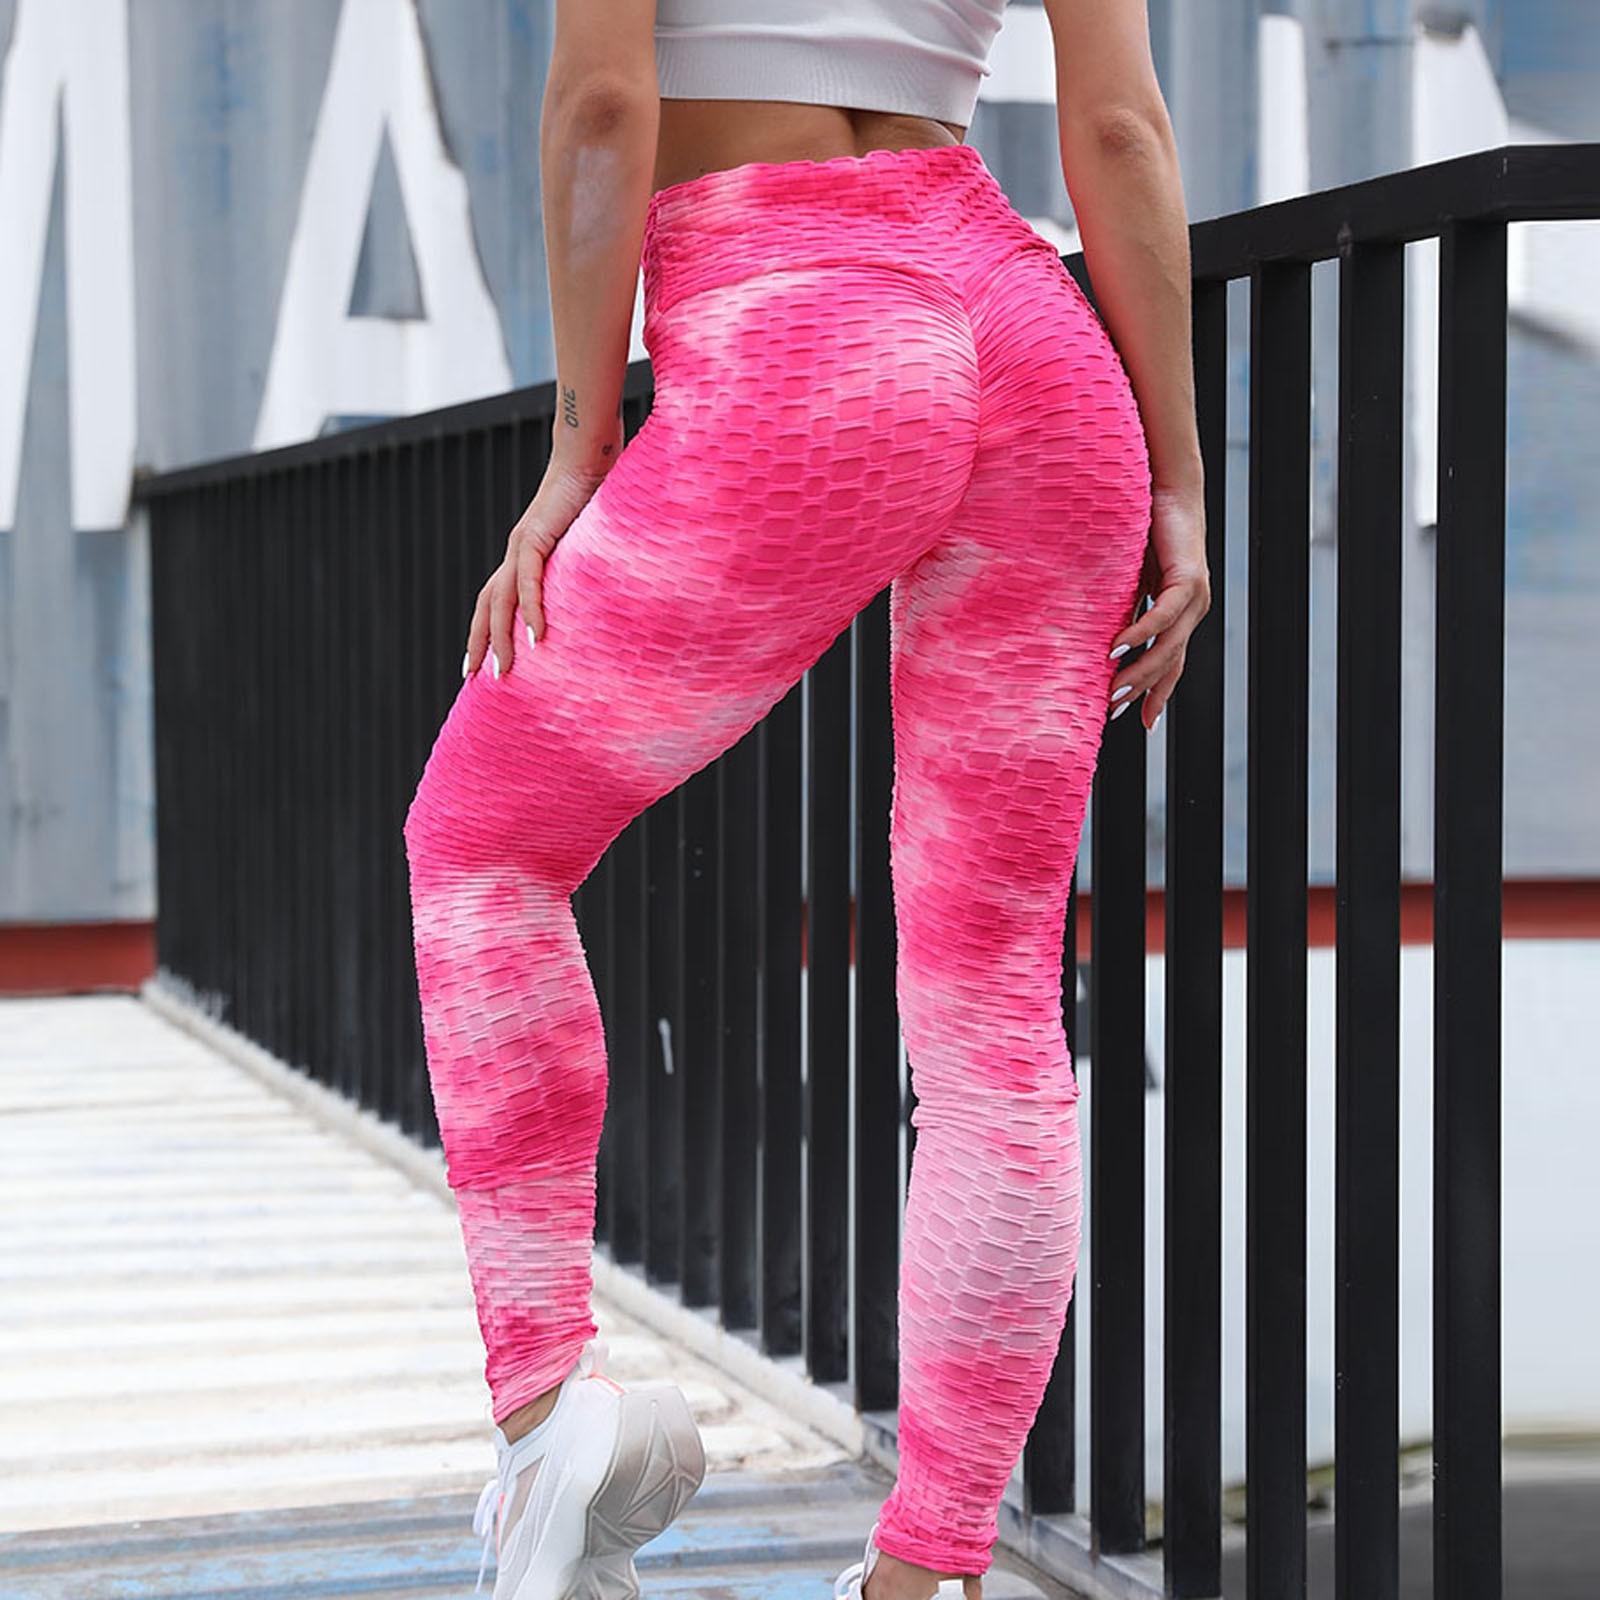 4# Leggings Women Ink Tie dye Honeycomb High stretch Leggings Push Up Bubble Anti cellulite Leggings Women Штаны Женский|Leggings| - AliExpress